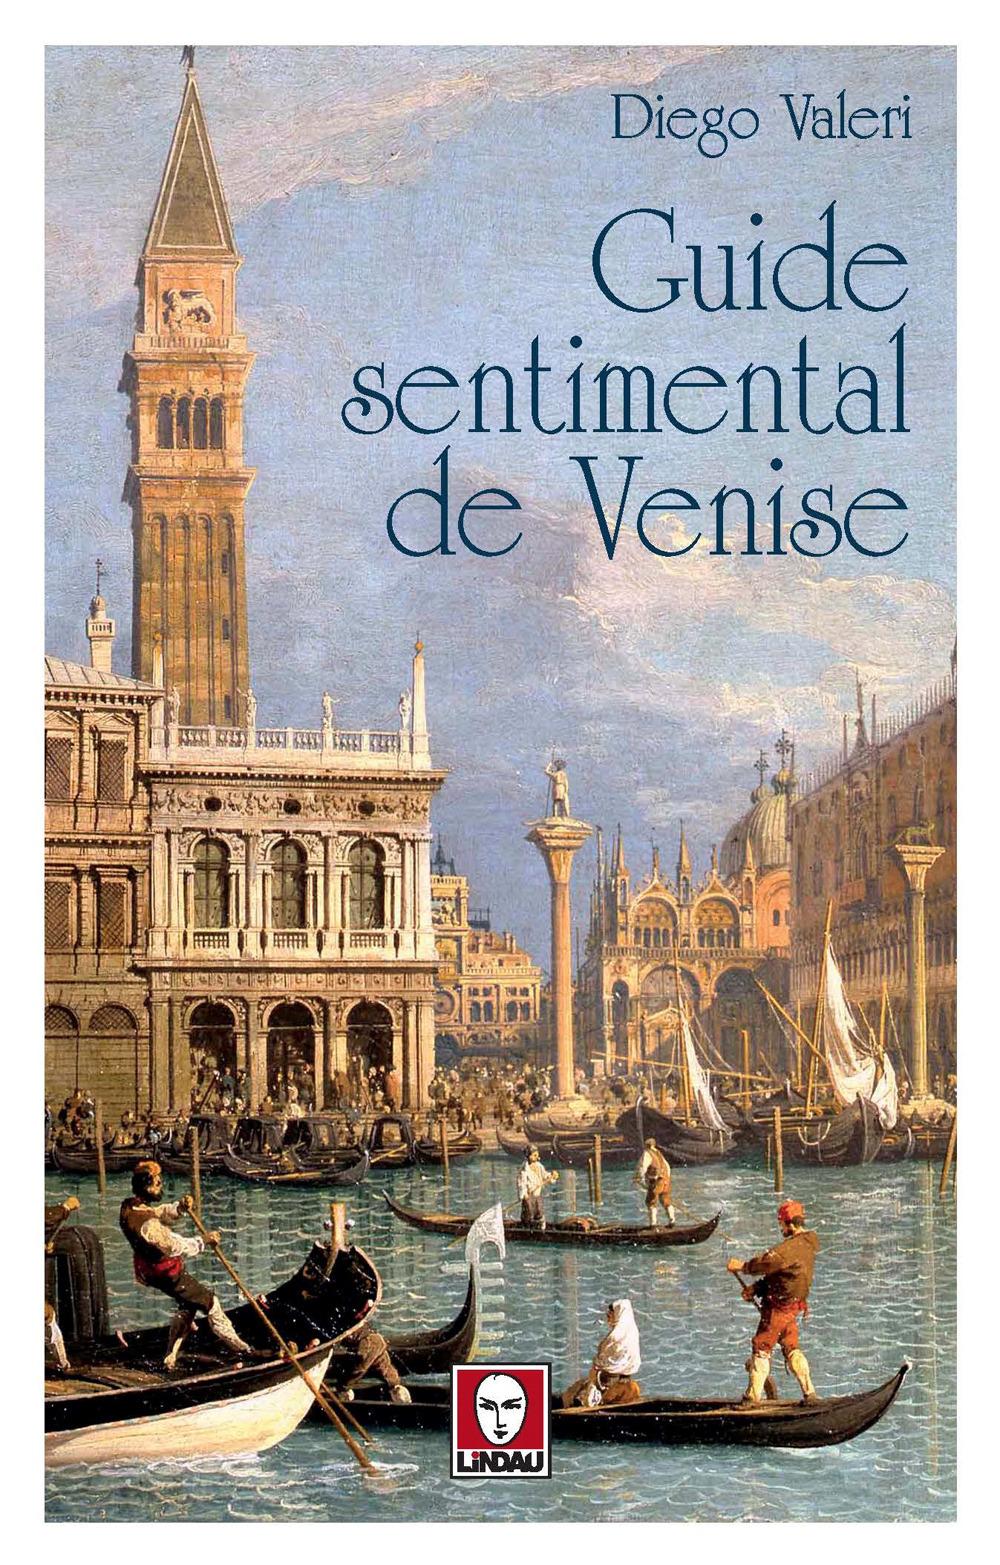 GUIDE SENTIMENTAL DE VENISE - Valeri Diego - 9788833533841